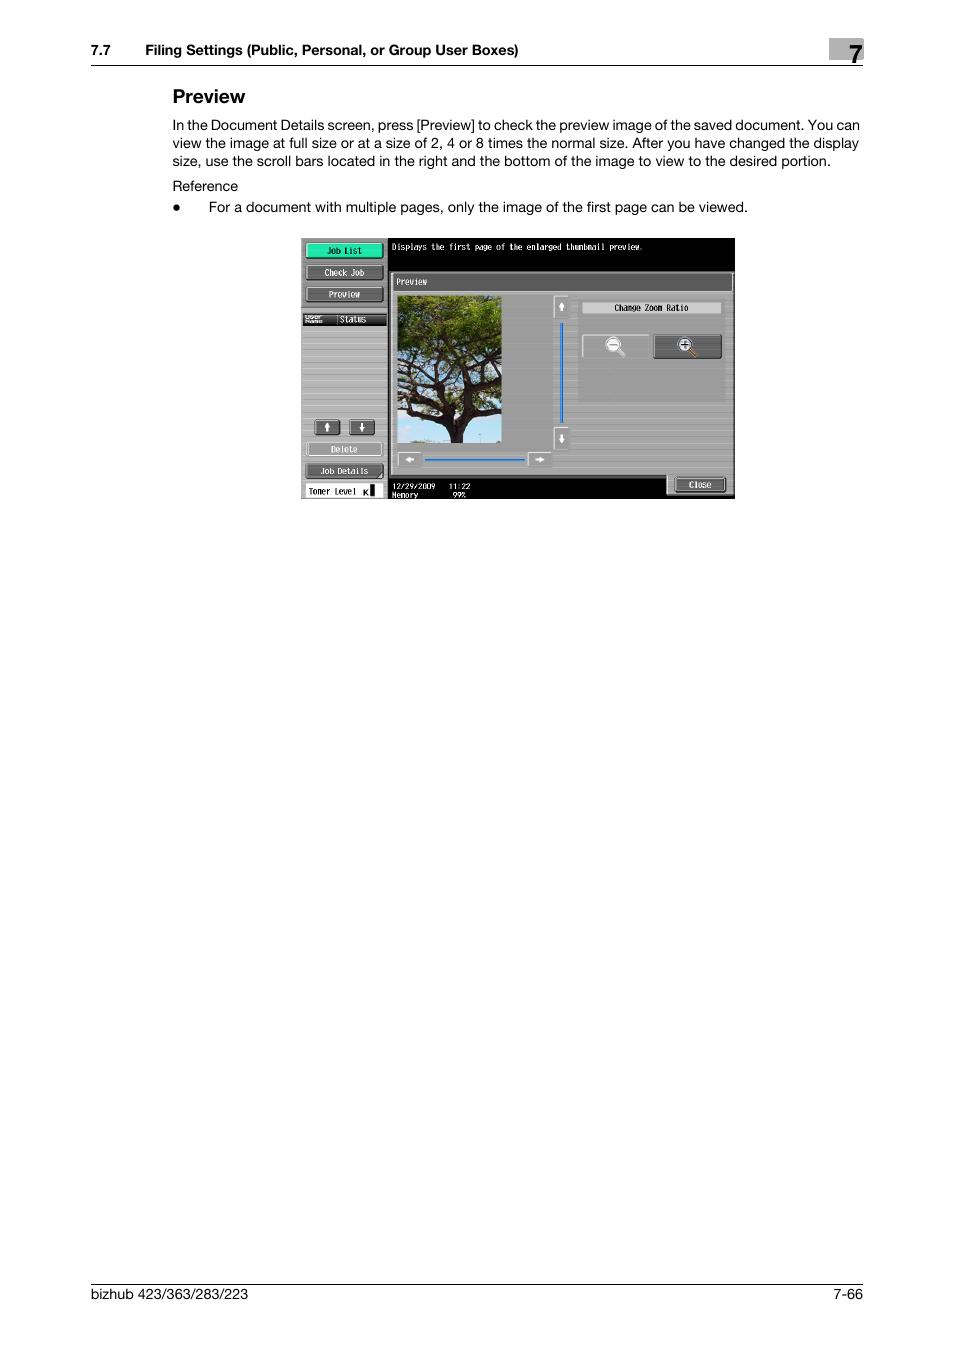 preview preview 66 review p 7 66 konica minolta bizhub 223 rh manualsdir com konica minolta bizhub 363 user manual scan konica minolta bizhub 363 user guide network administrator